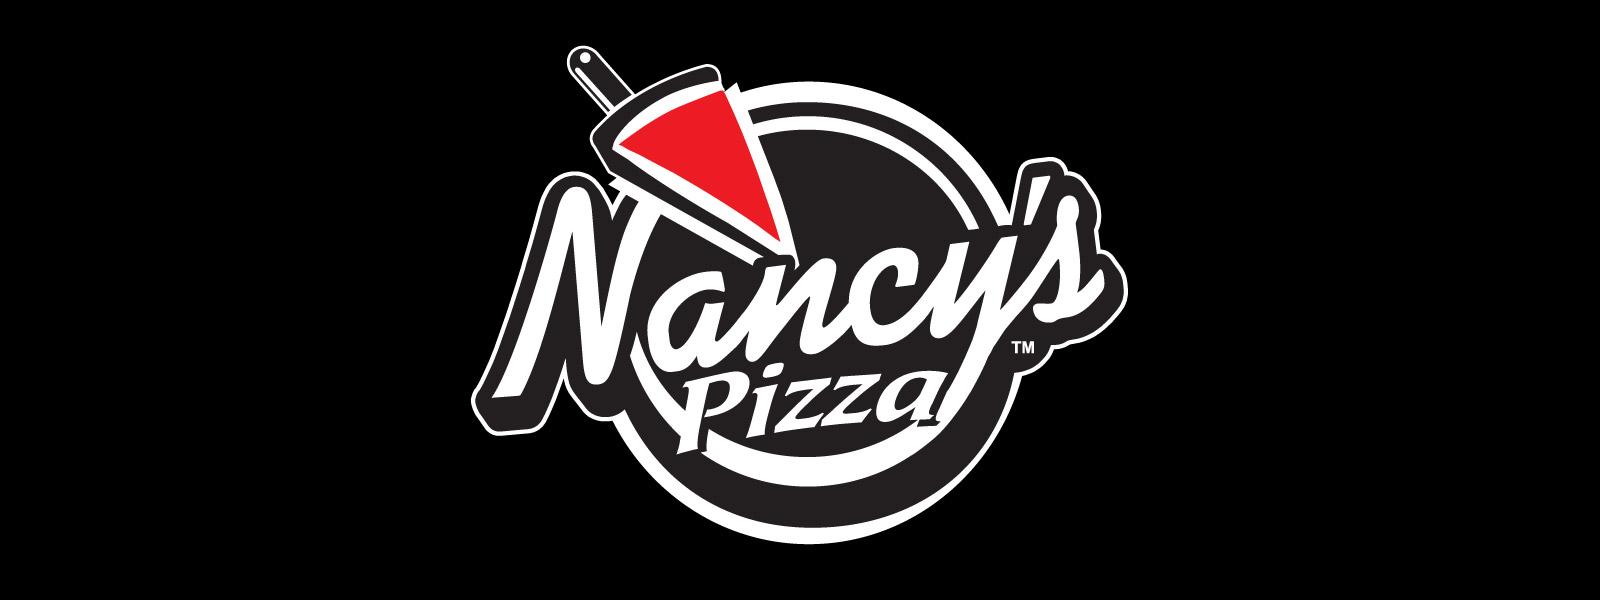 nancys-Pizza-header